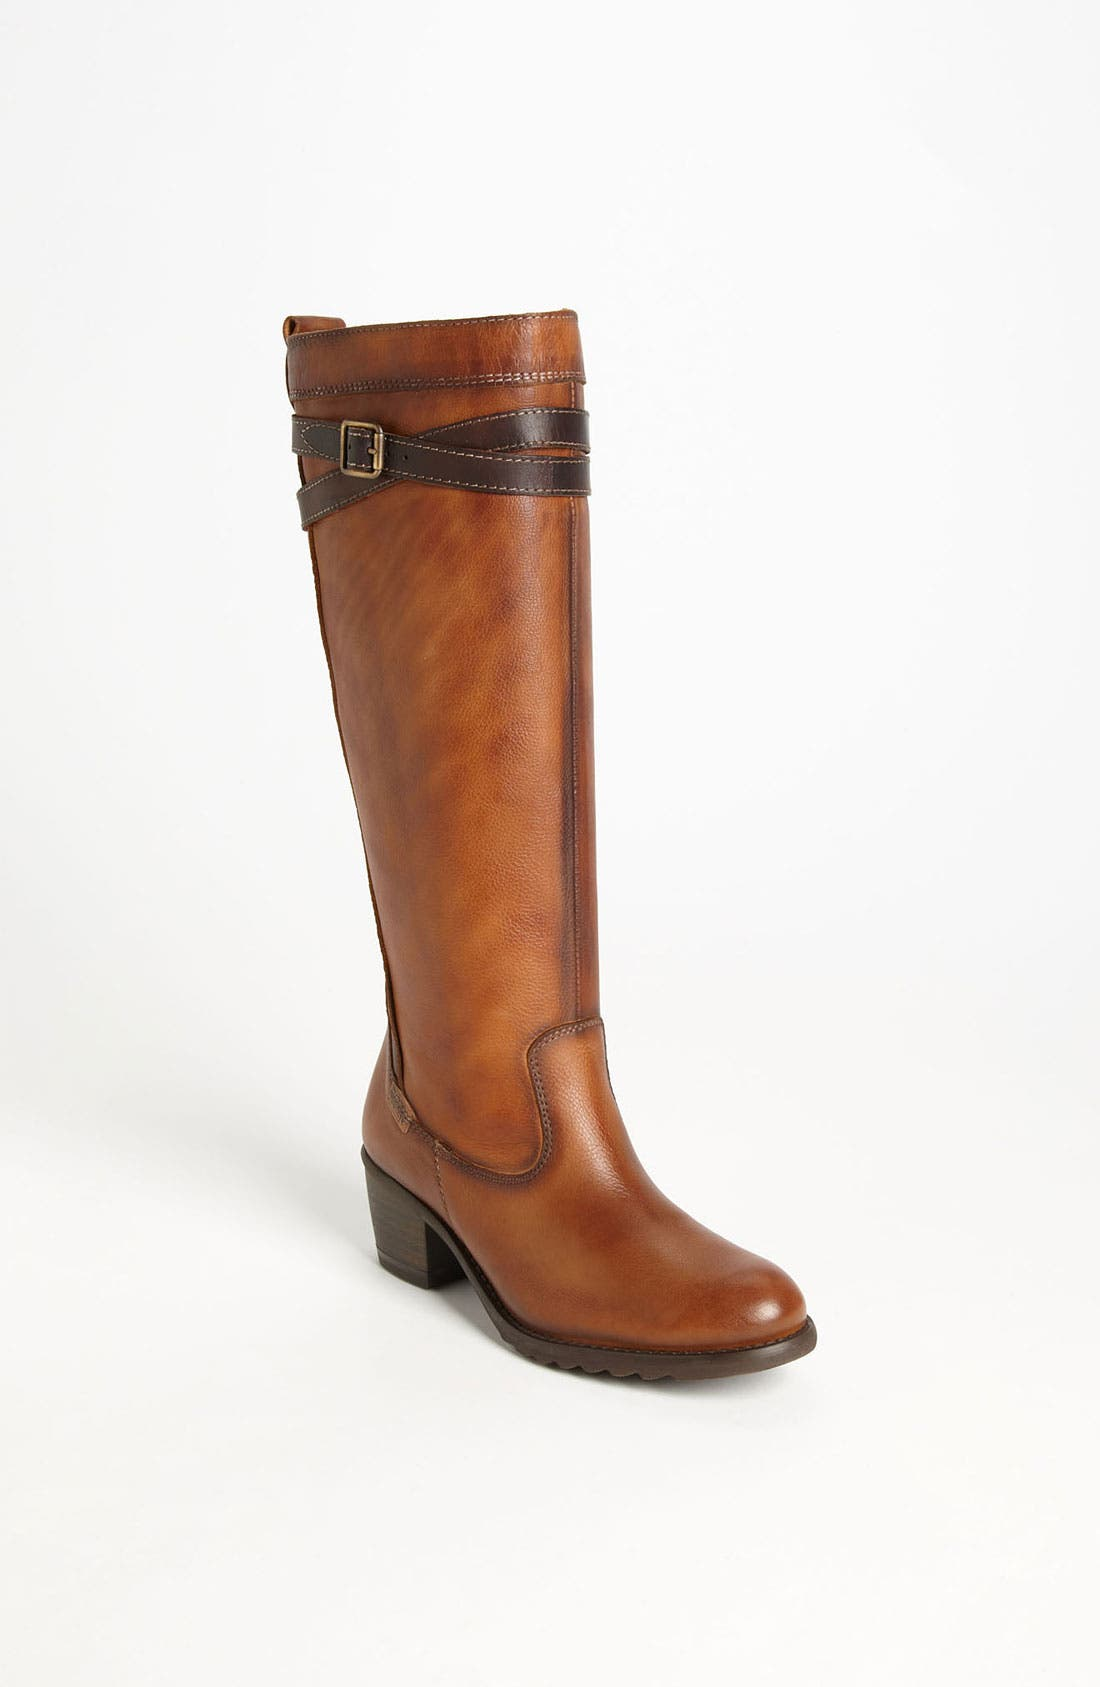 Alternate Image 1 Selected - PIKOLINOS 'Andorra' Tall Boot